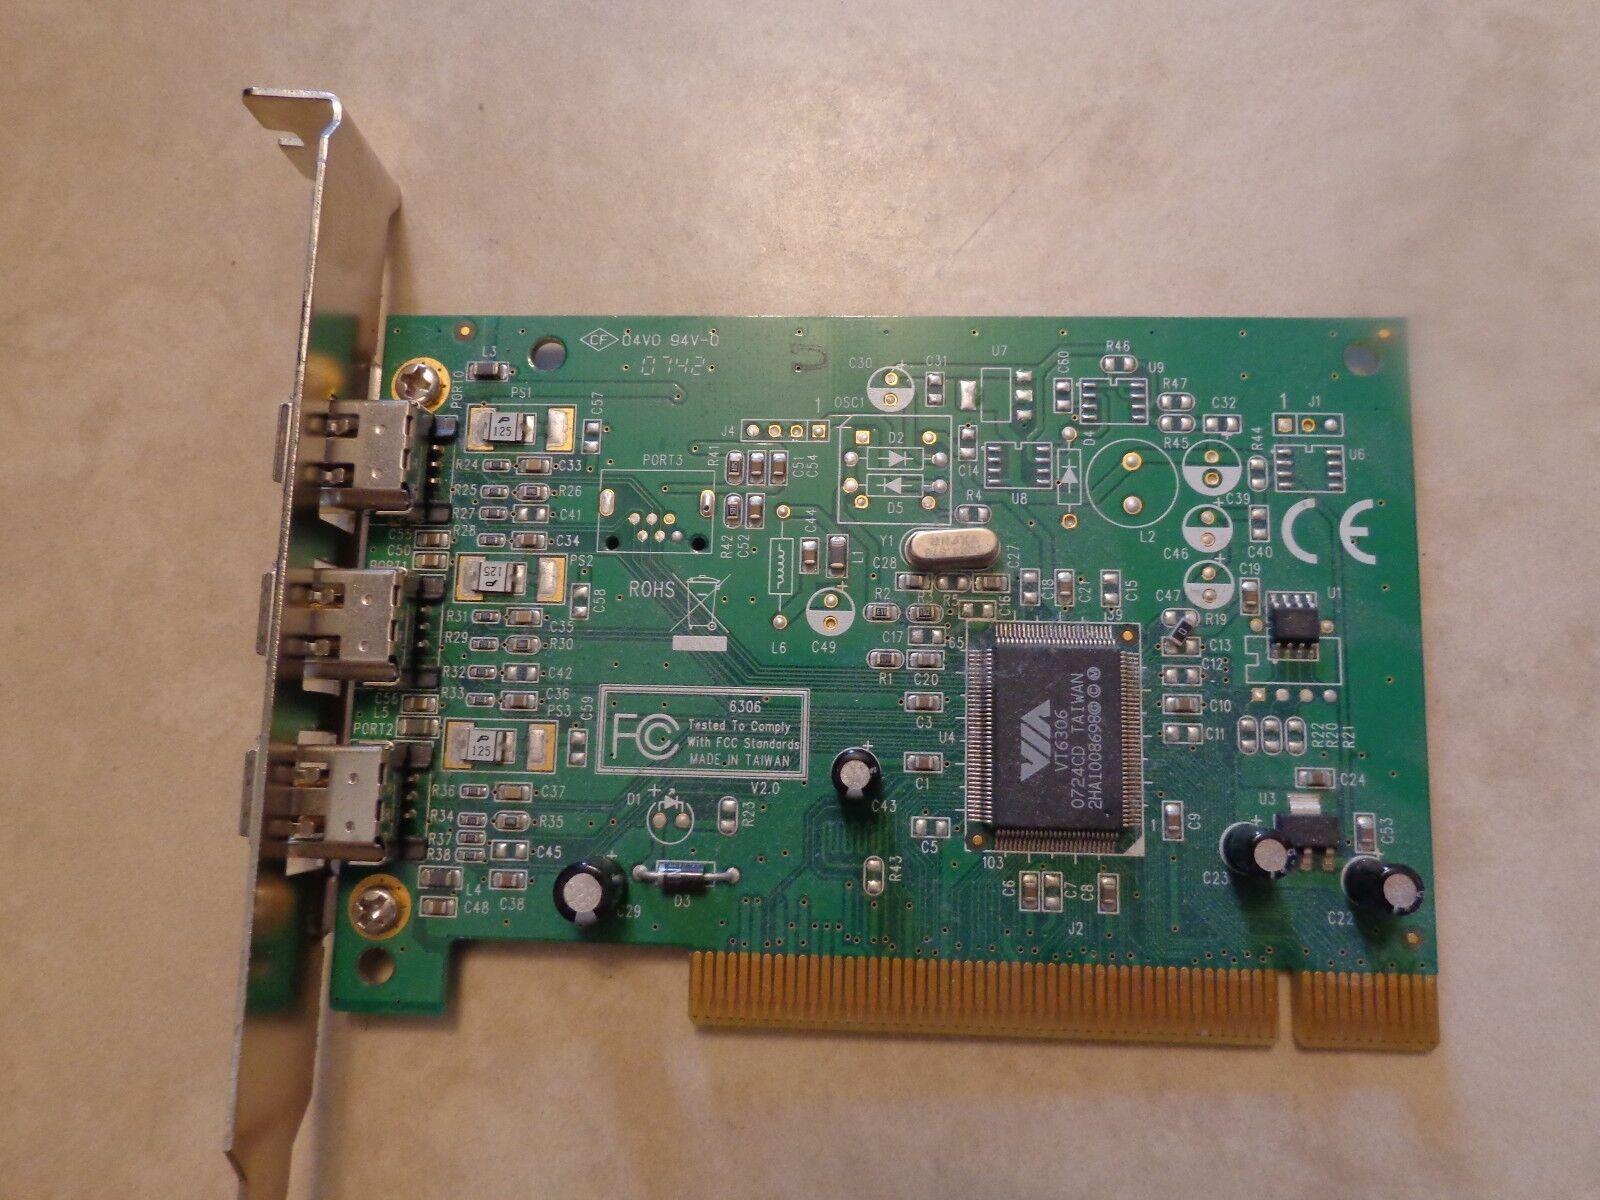 C2G 3-PORT FIREWIRE CARD BOARD IEEE1394 Port Authority PCI 29999